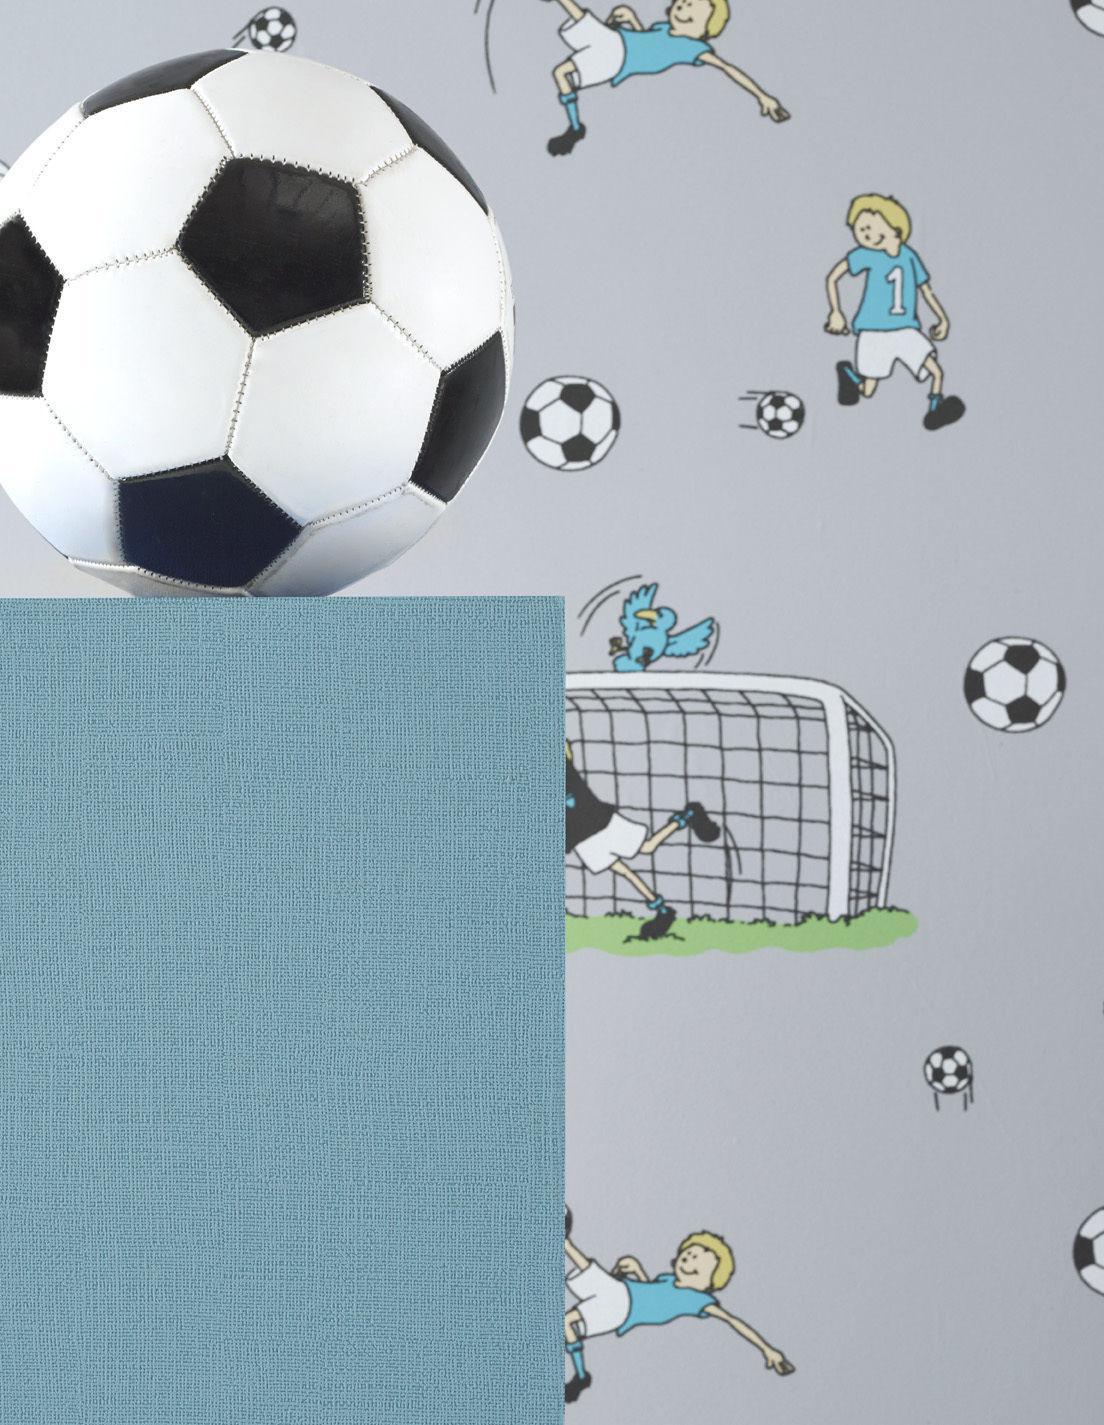 vlies tapete fußball kinder / jungen zimmer fussball tapete grau